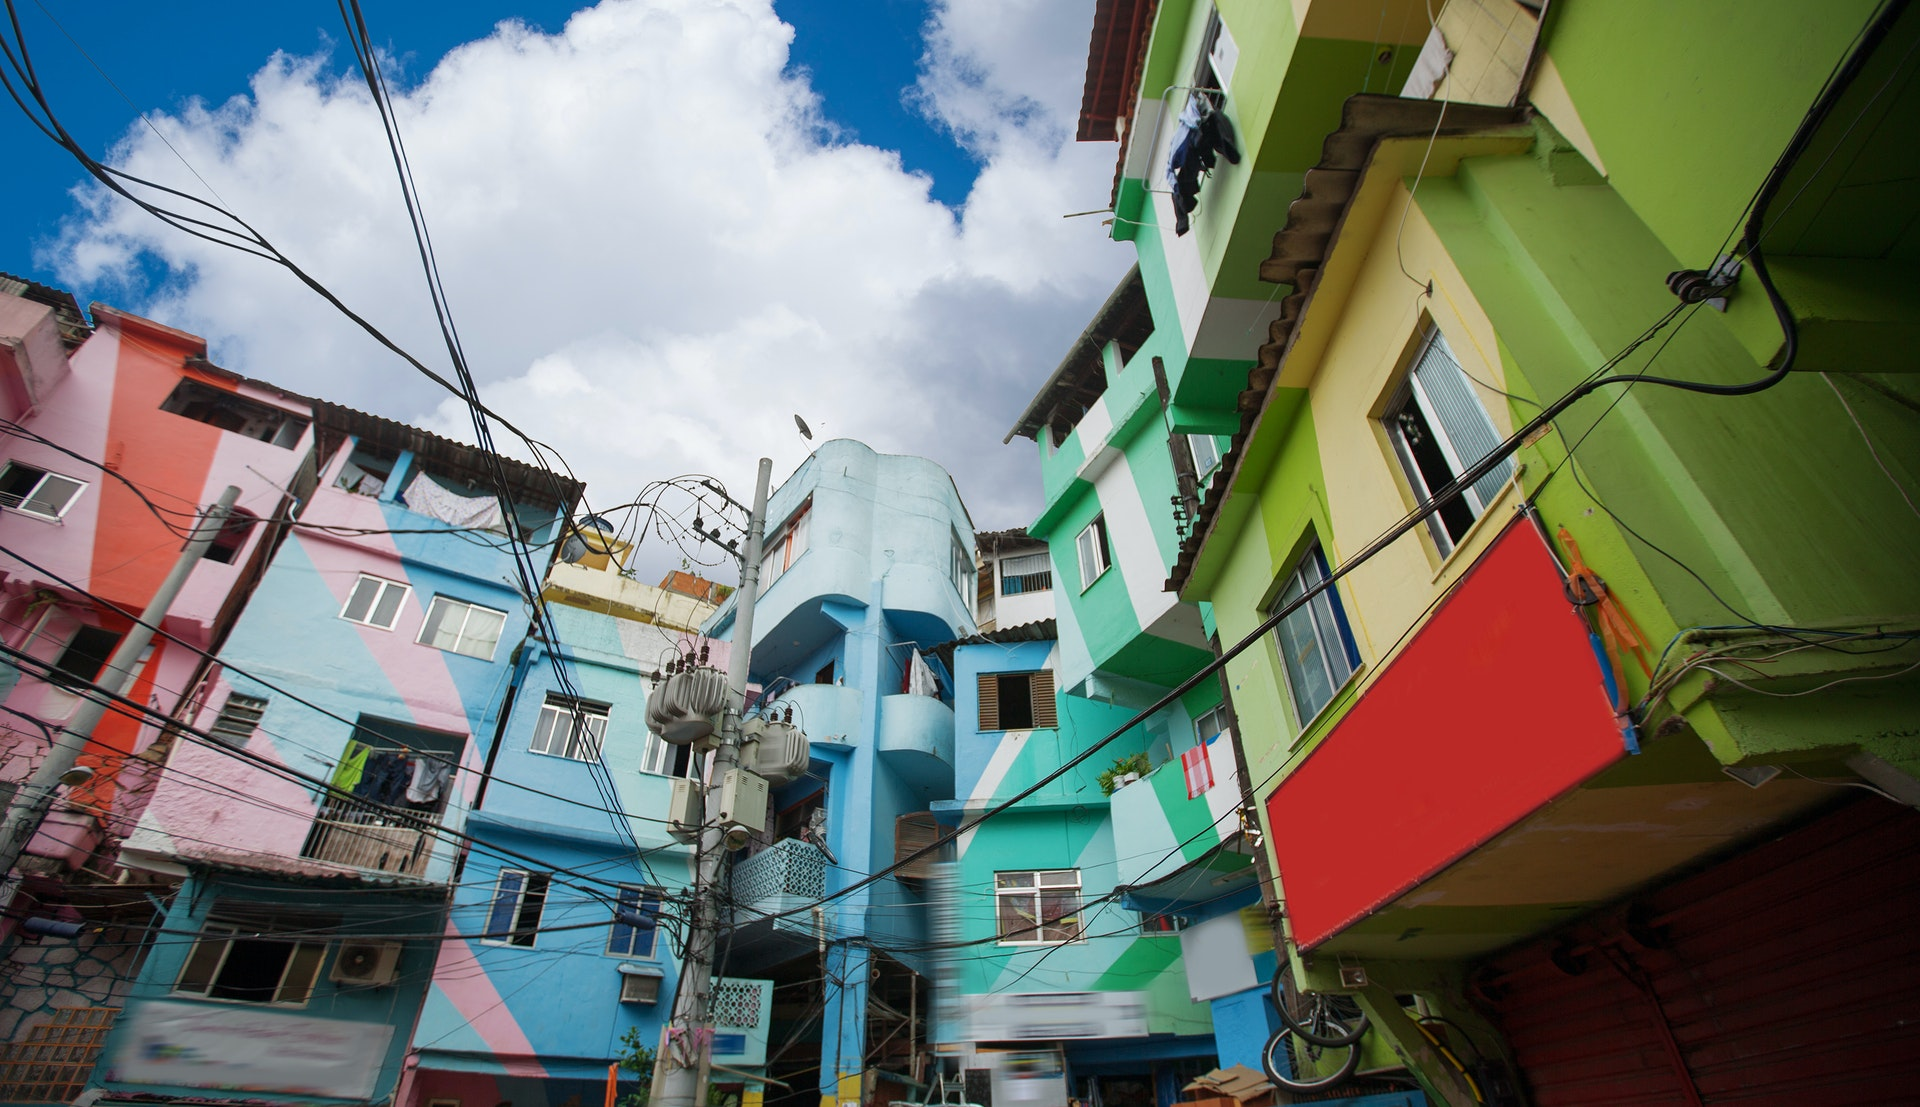 Fargerike Rio de Janeiro © Lindrik, Getty Images